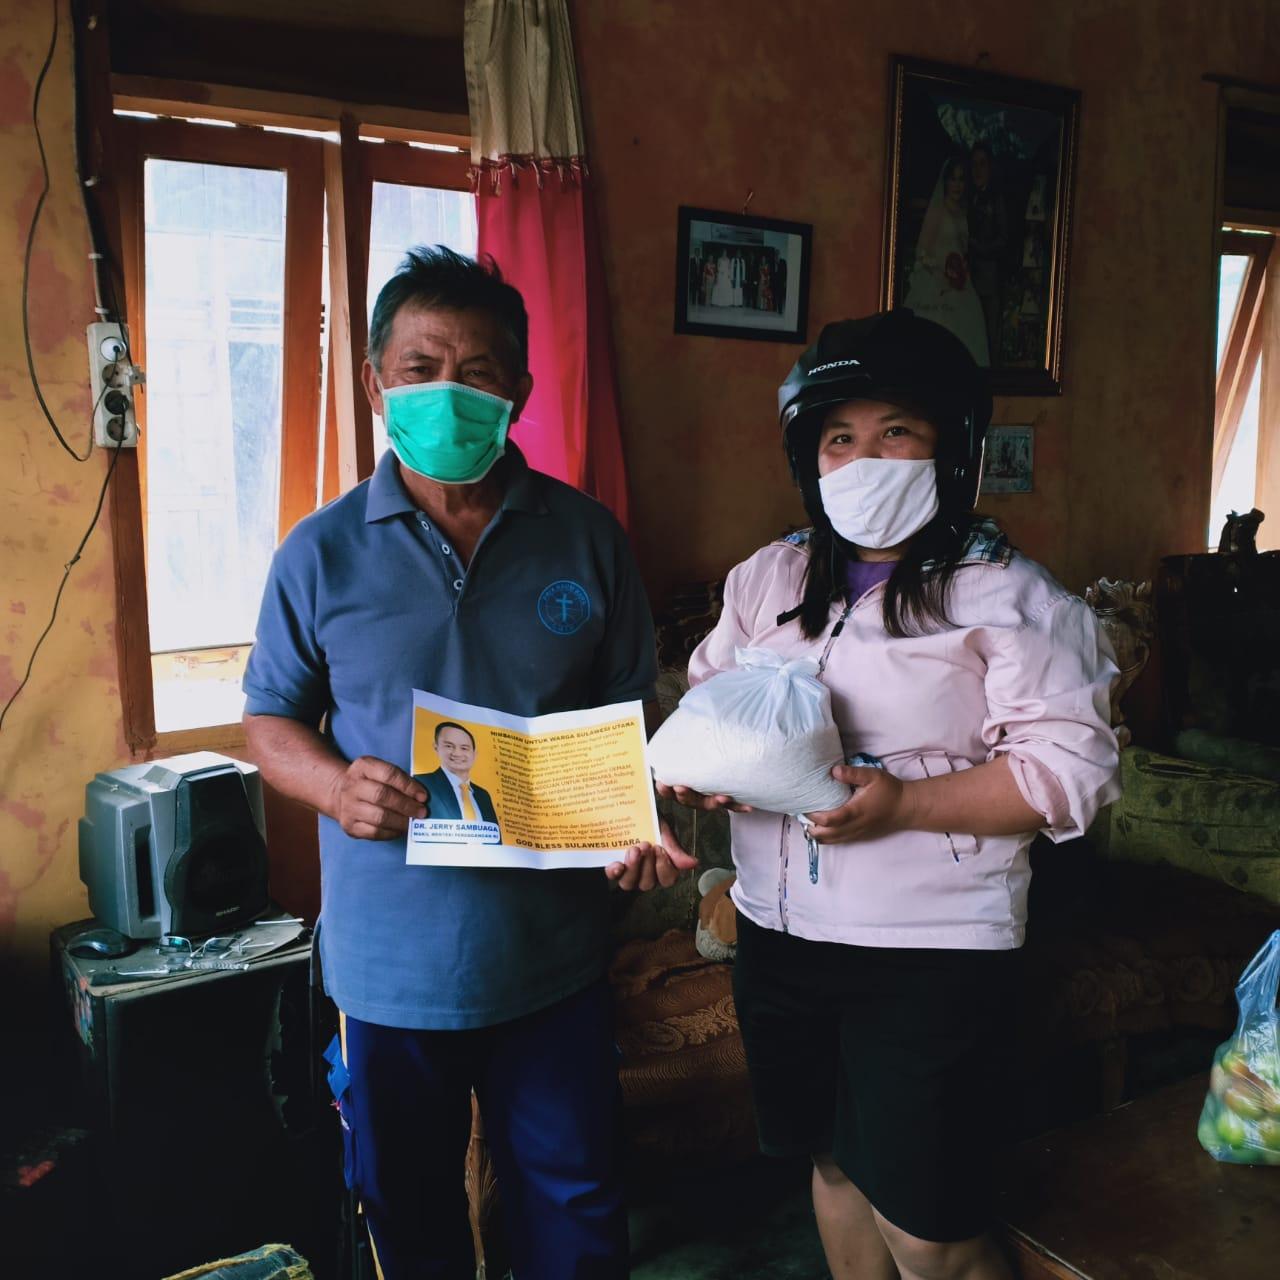 Wakil Menteri Jerry Sambuaga Berikan Bantuan Sembako dan Alat Kesehatan untuk Warga Minahasa